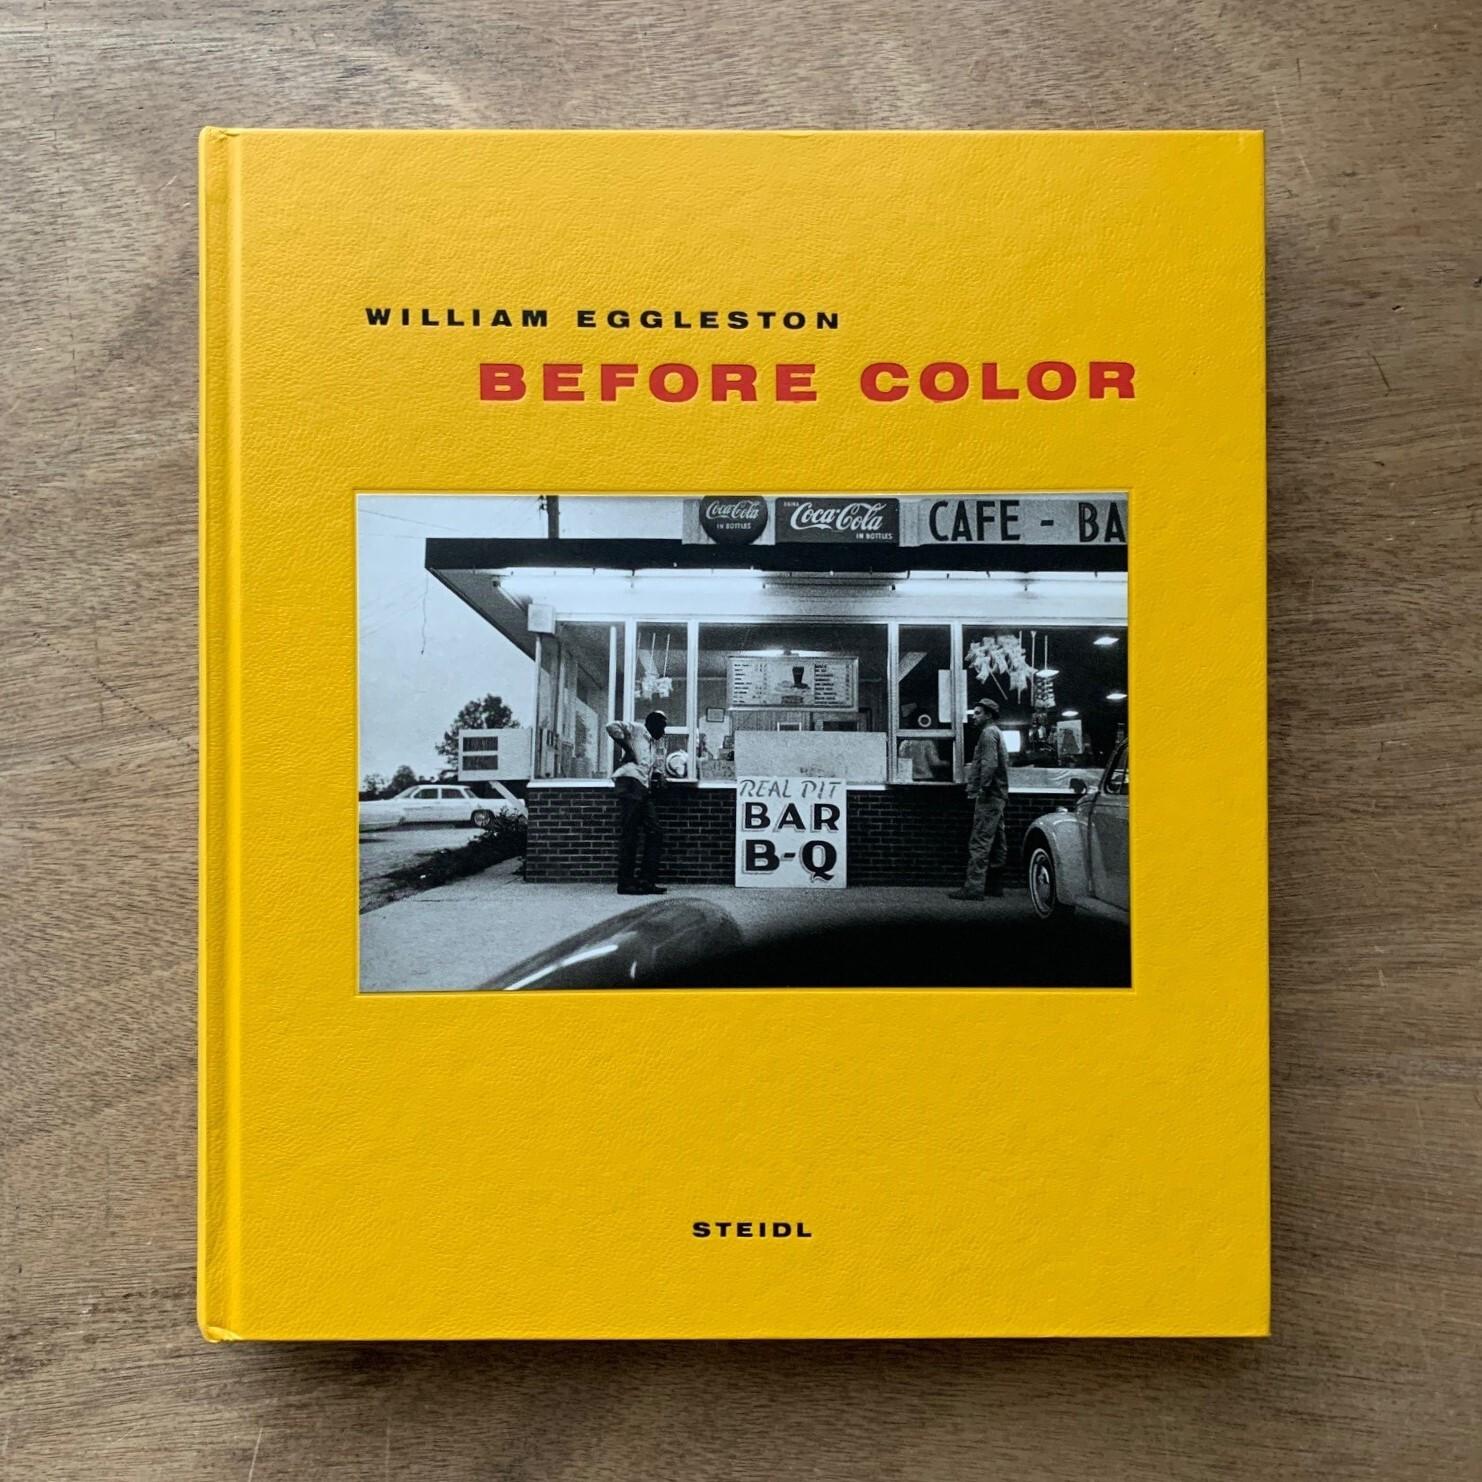 Before color / William Eggleston ウィリアム・エグルストン